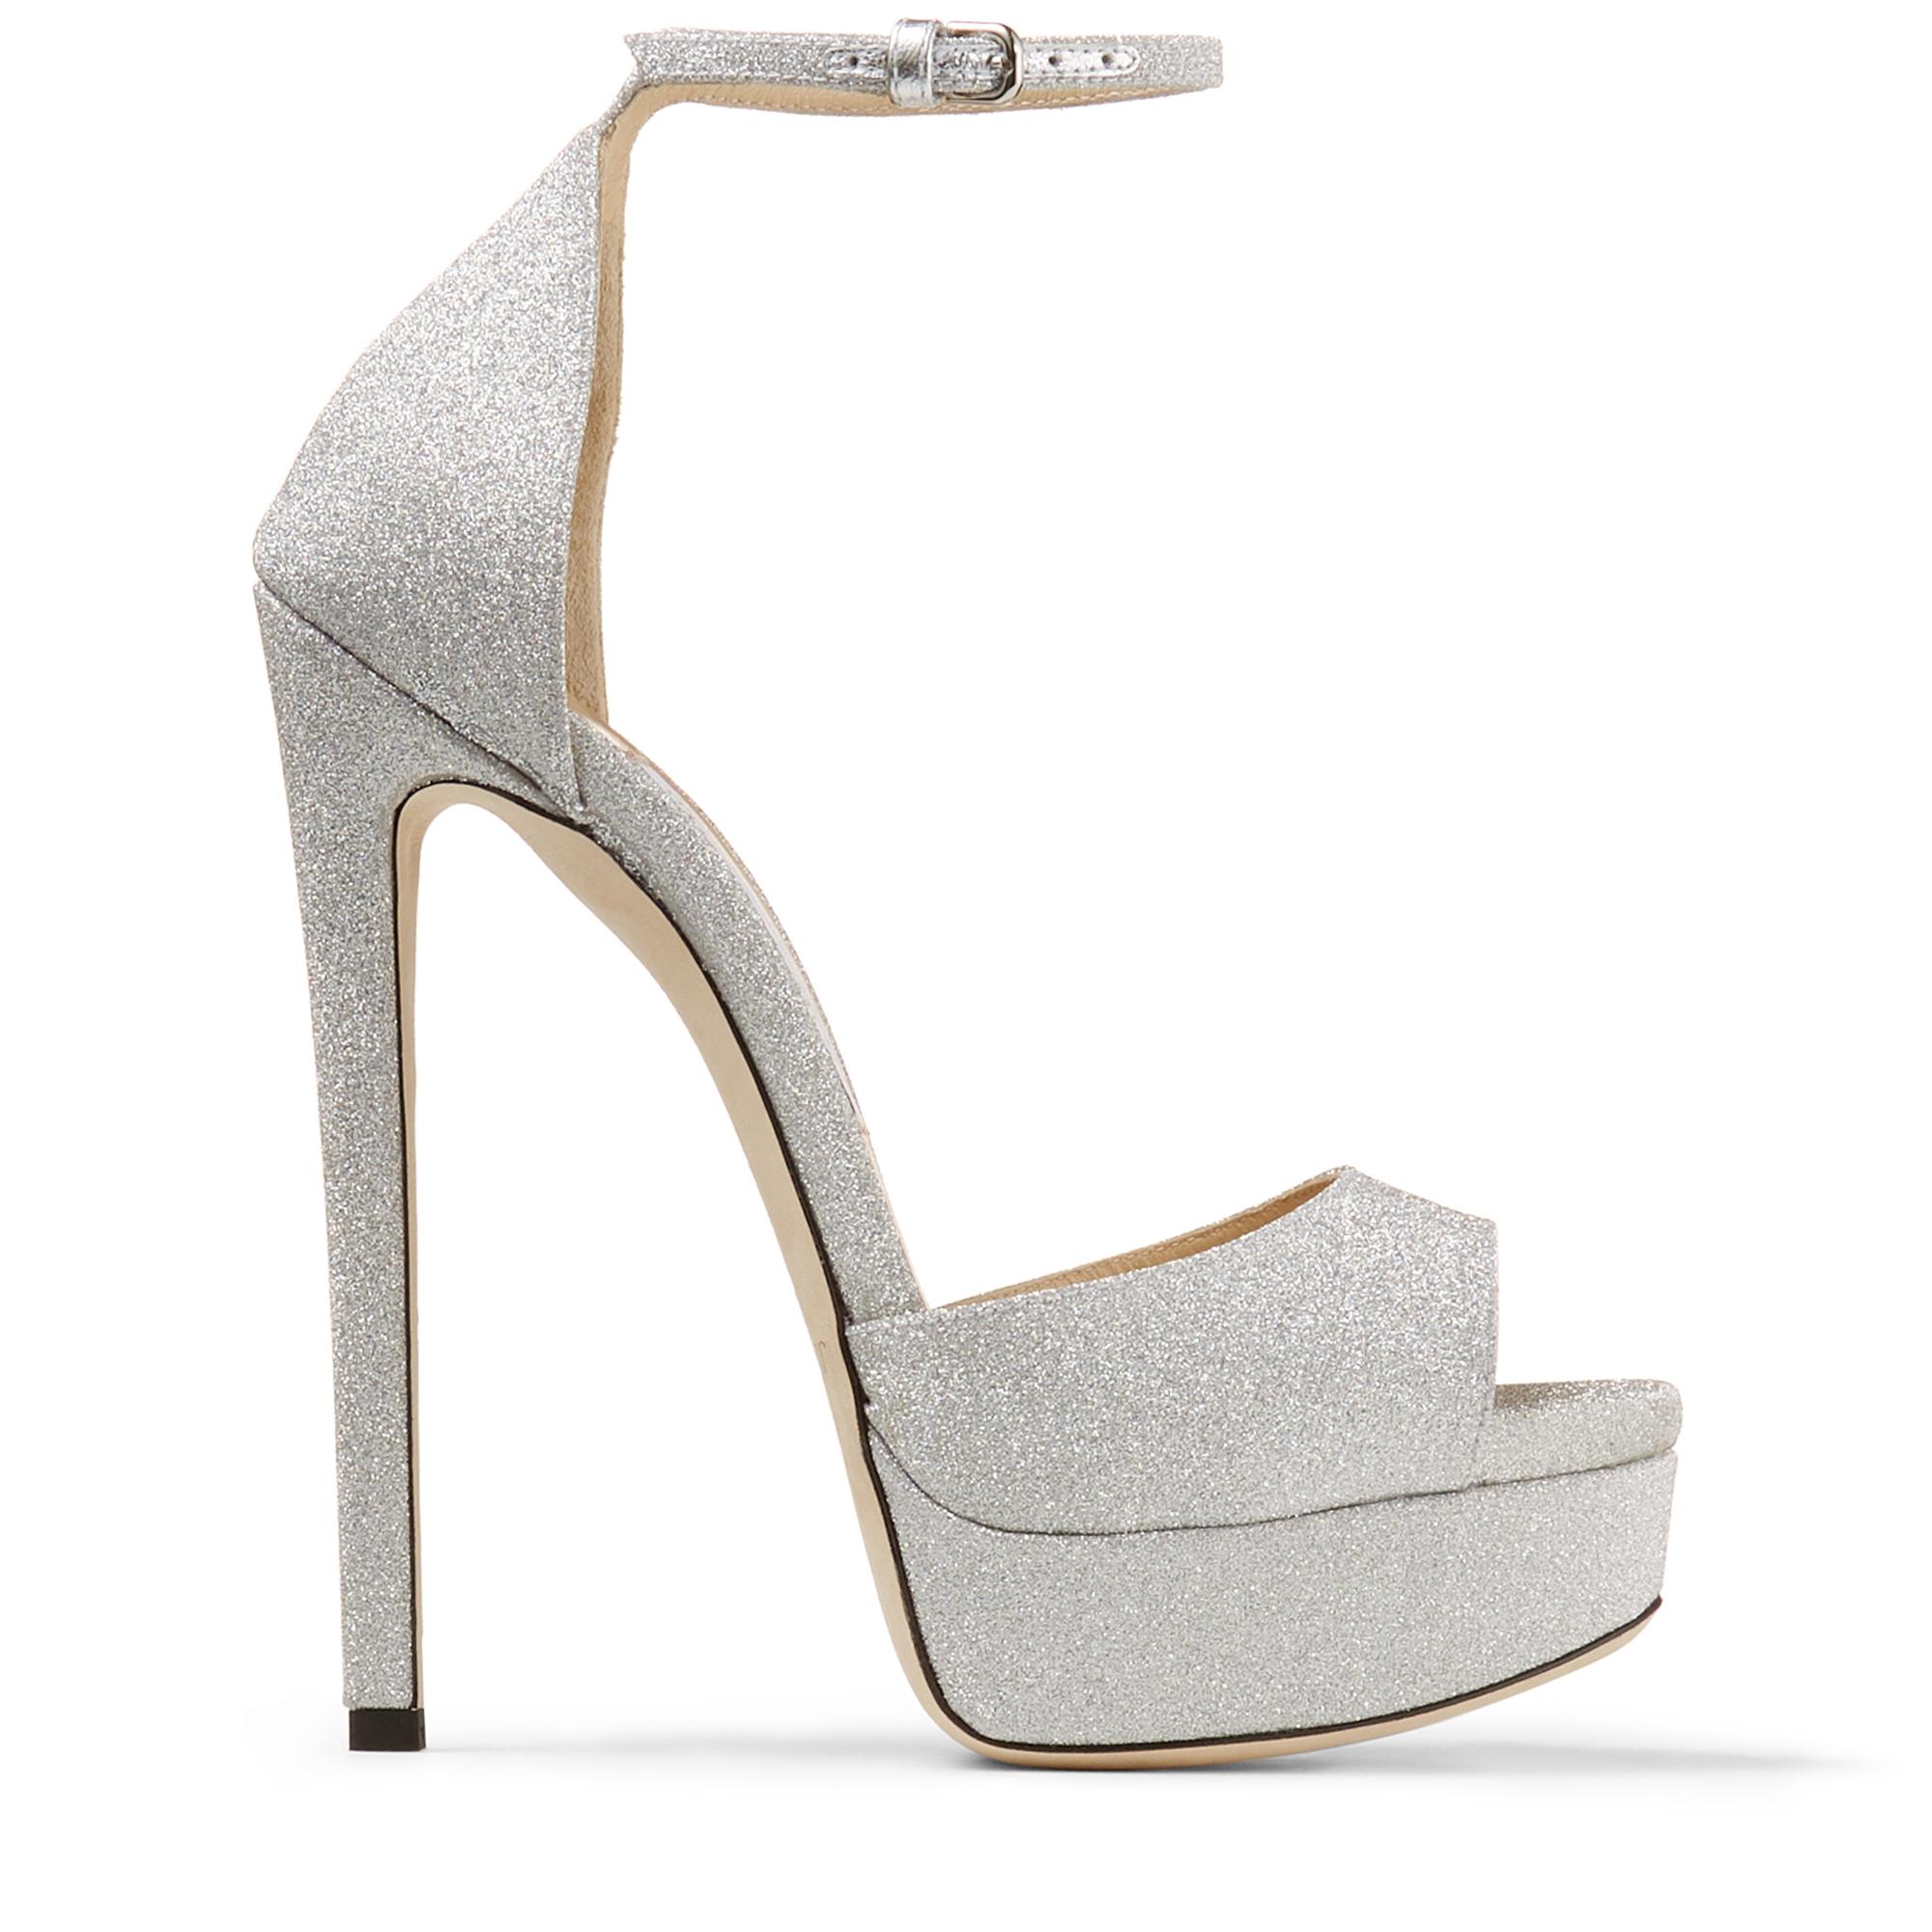 Max 150 sandals